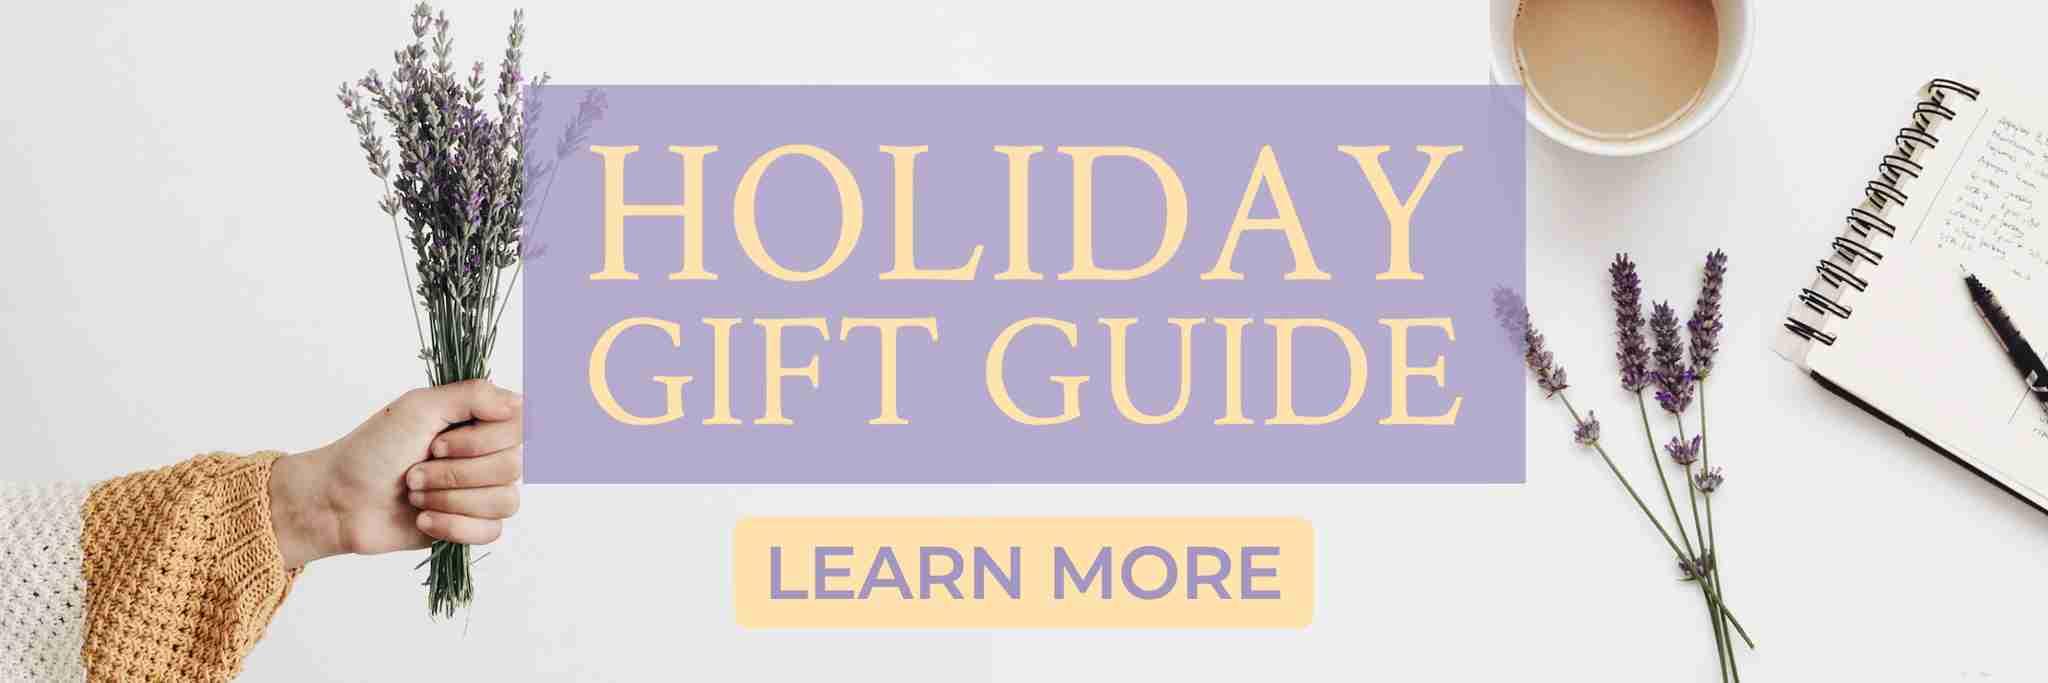 Holiday gift guide - Suzi's Lavender